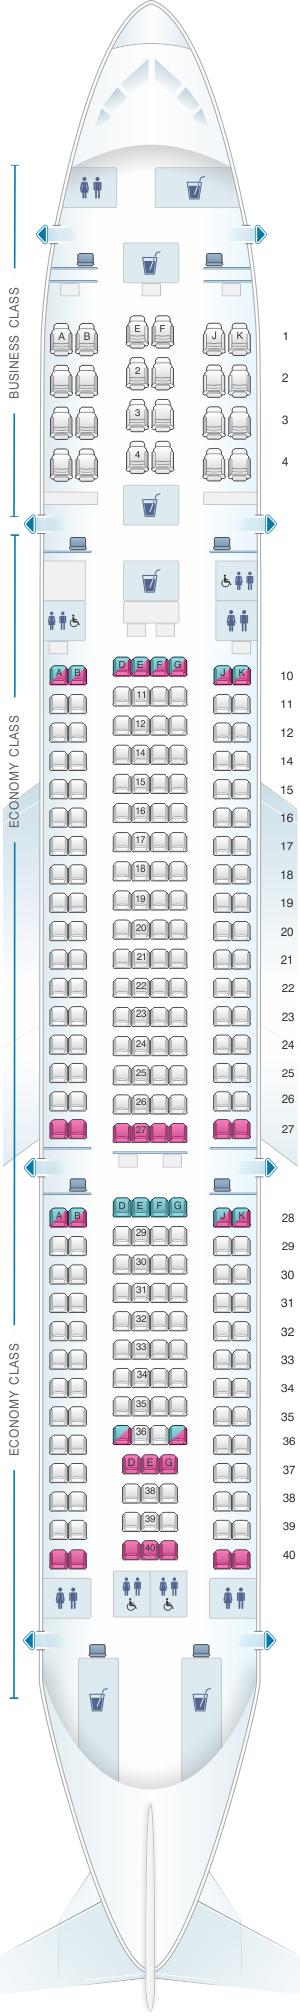 Seat map for Qatar Airways Airbus A330 200 260pax